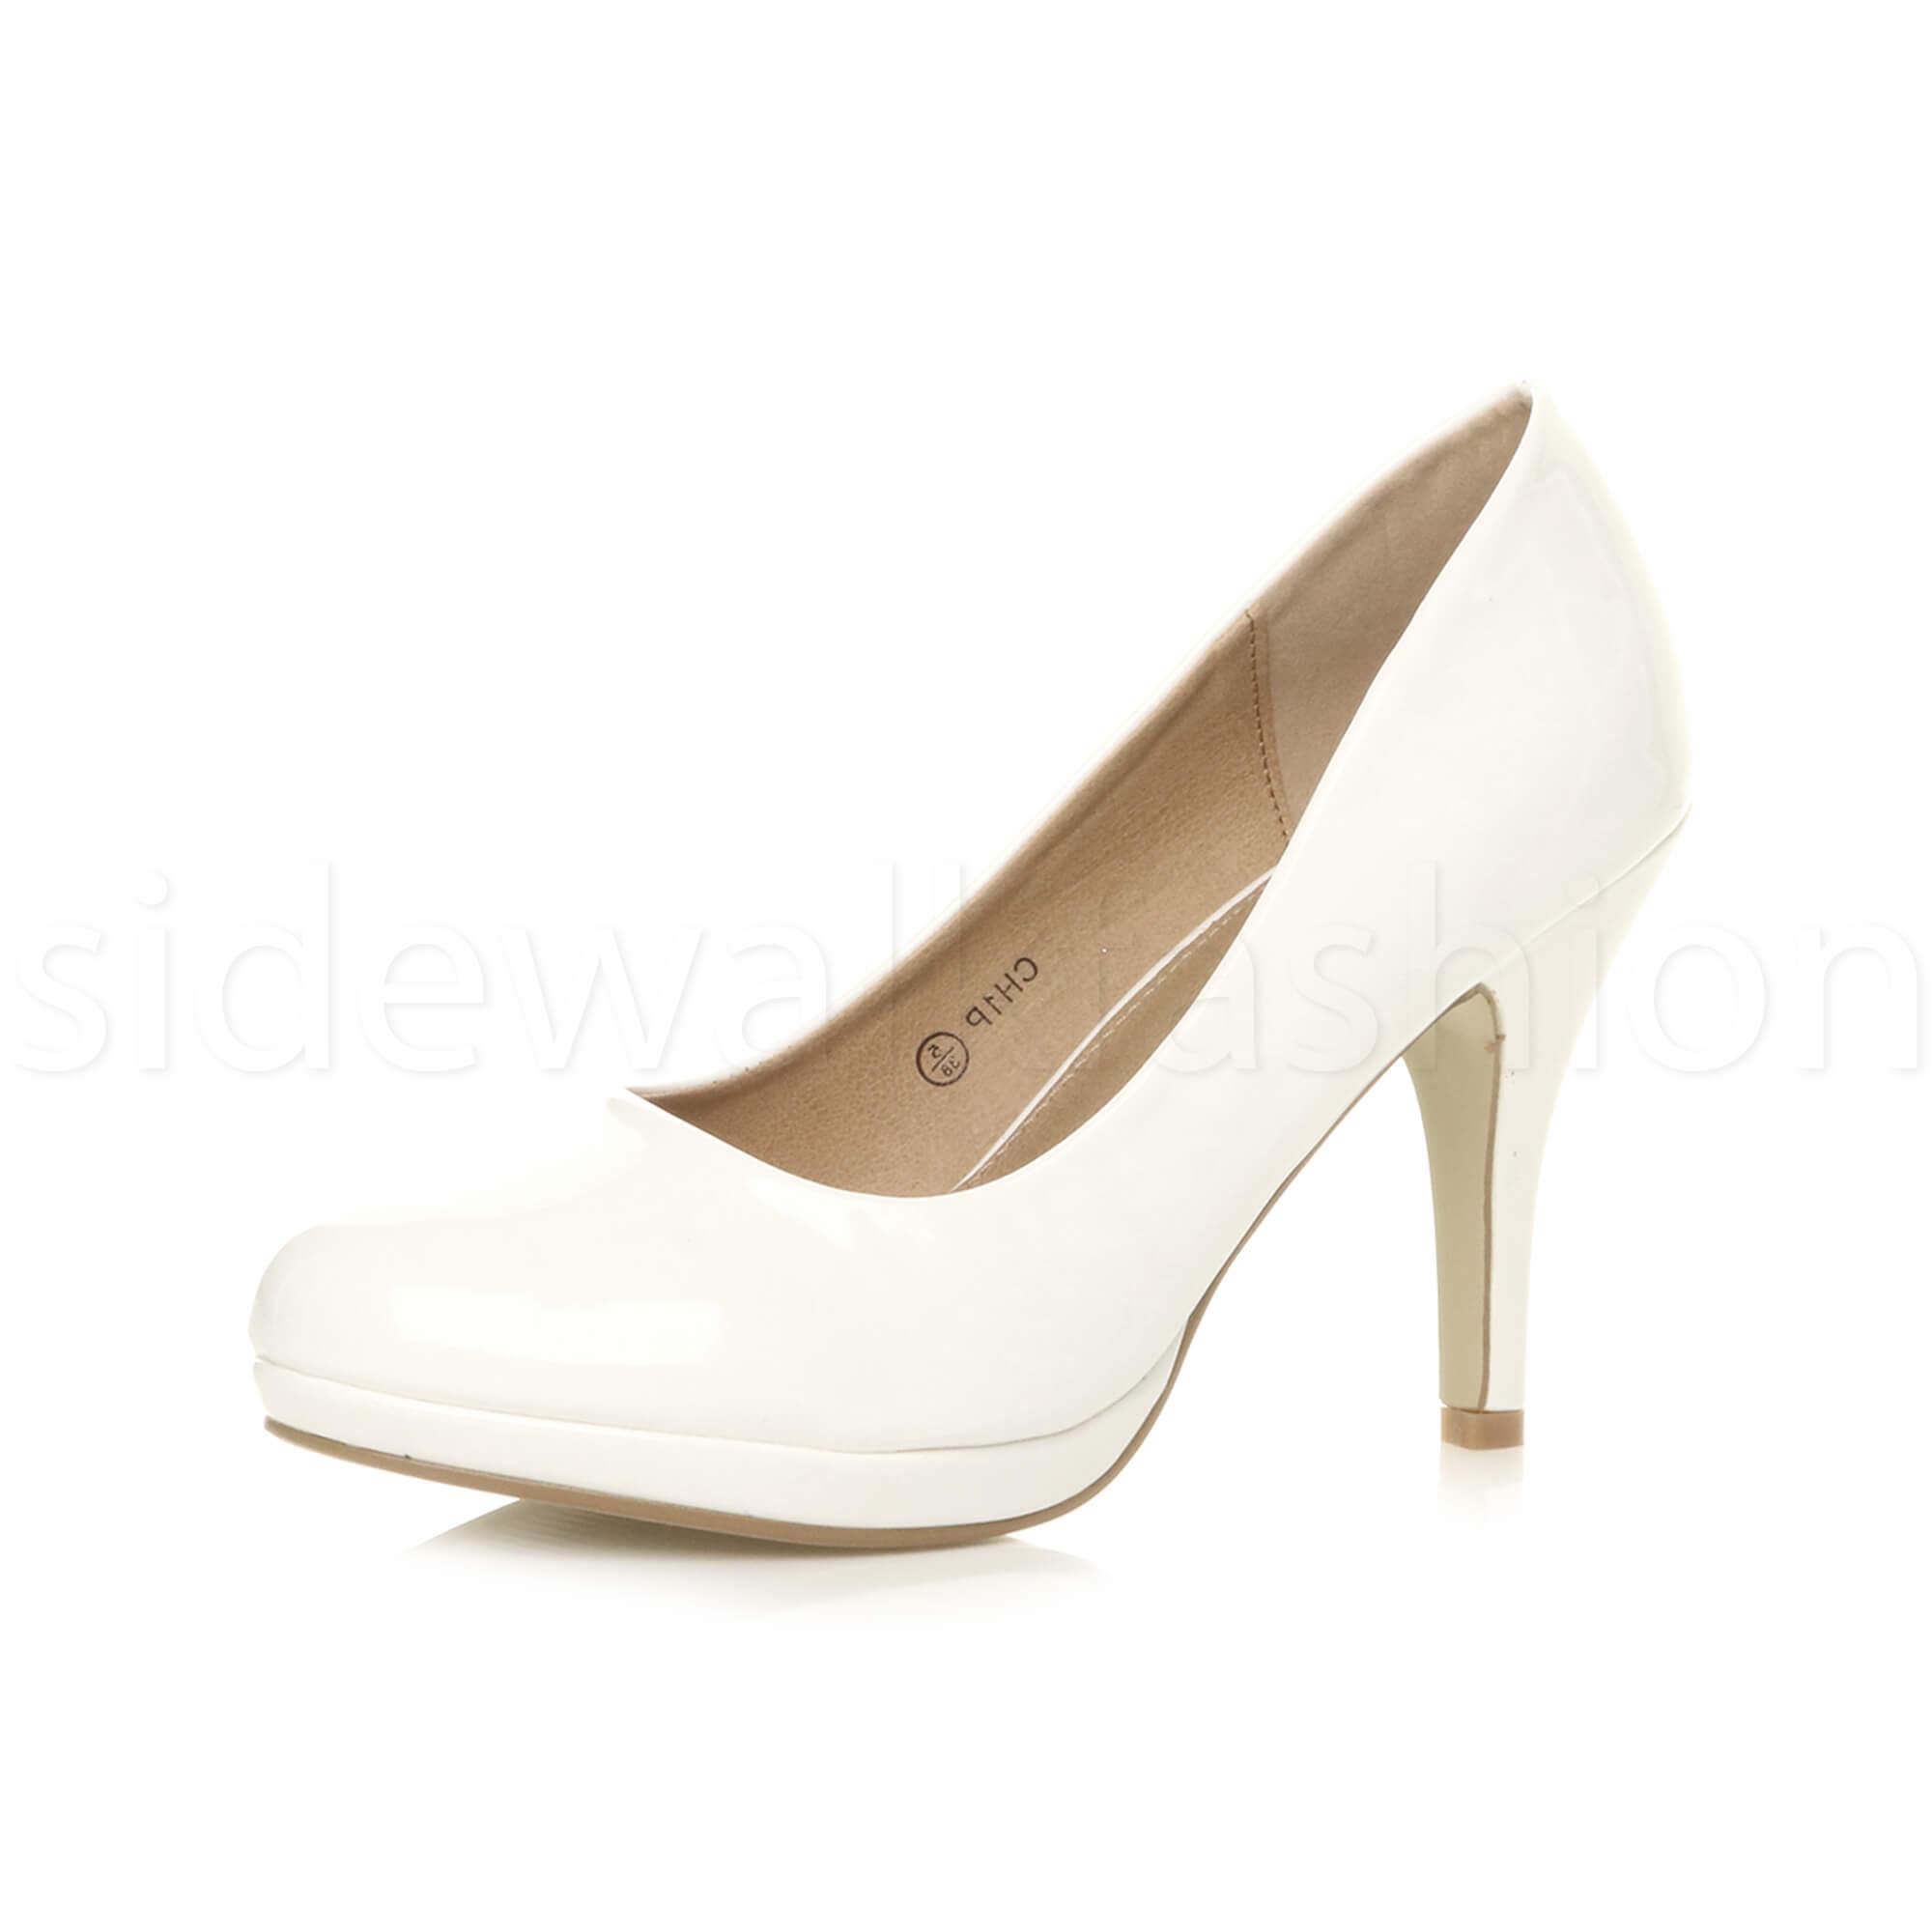 184192ac50c7 Womens Ladies High Mid Heel Platform Work Evening Party PUMPS Court ...